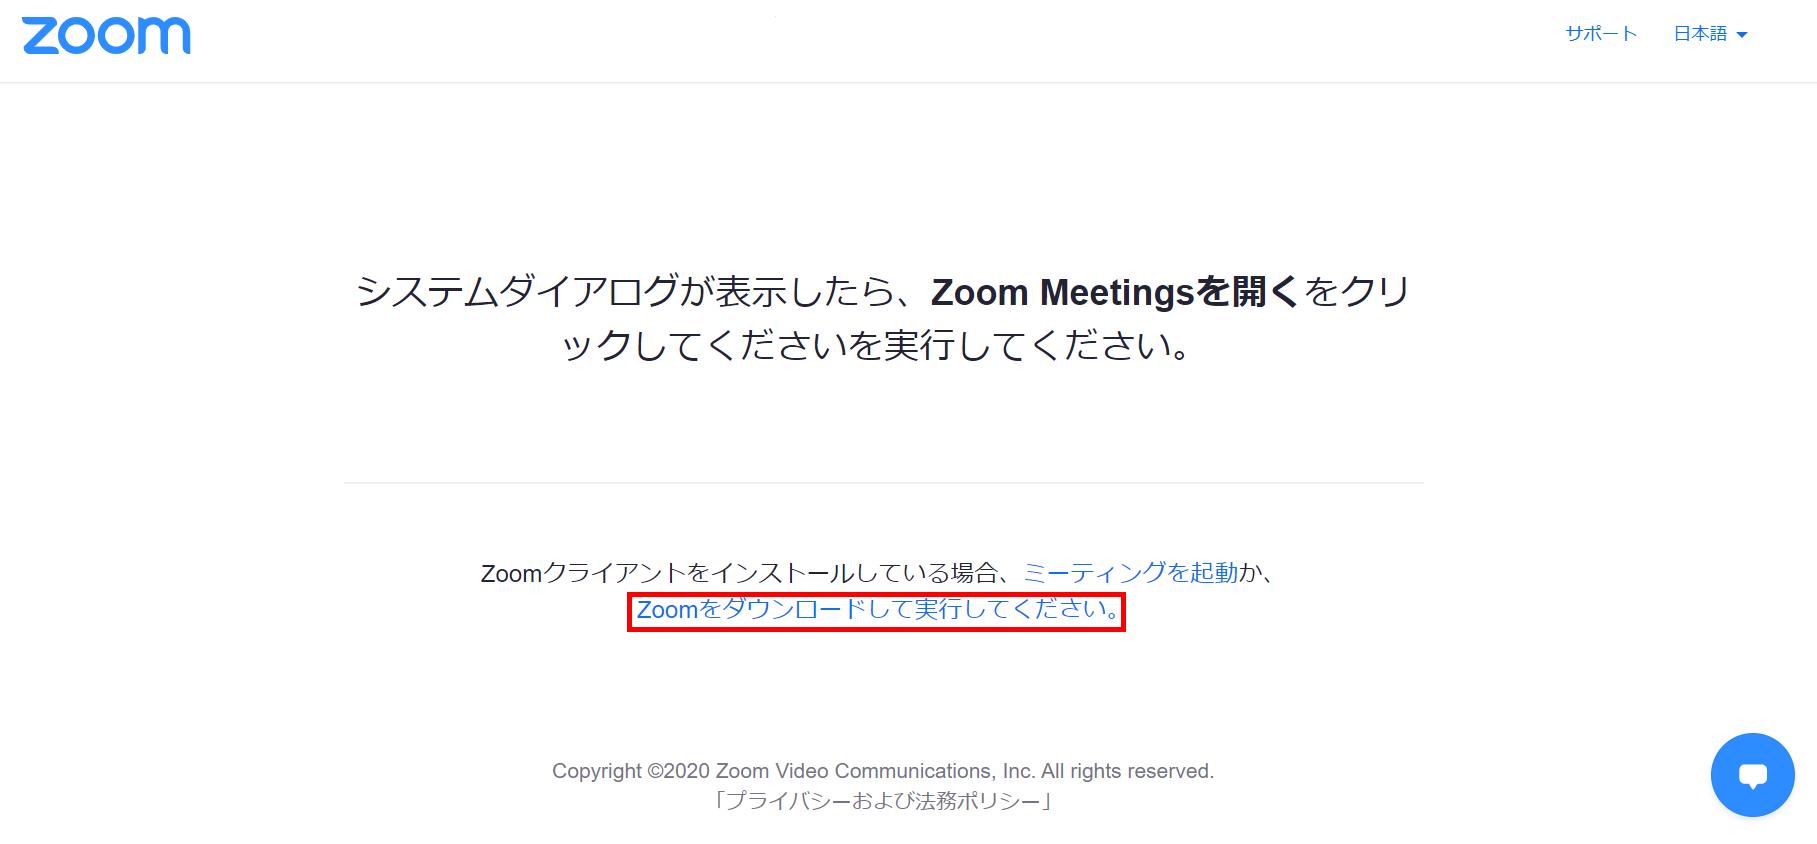 Zoomアプリをパソコンにインストールする方法